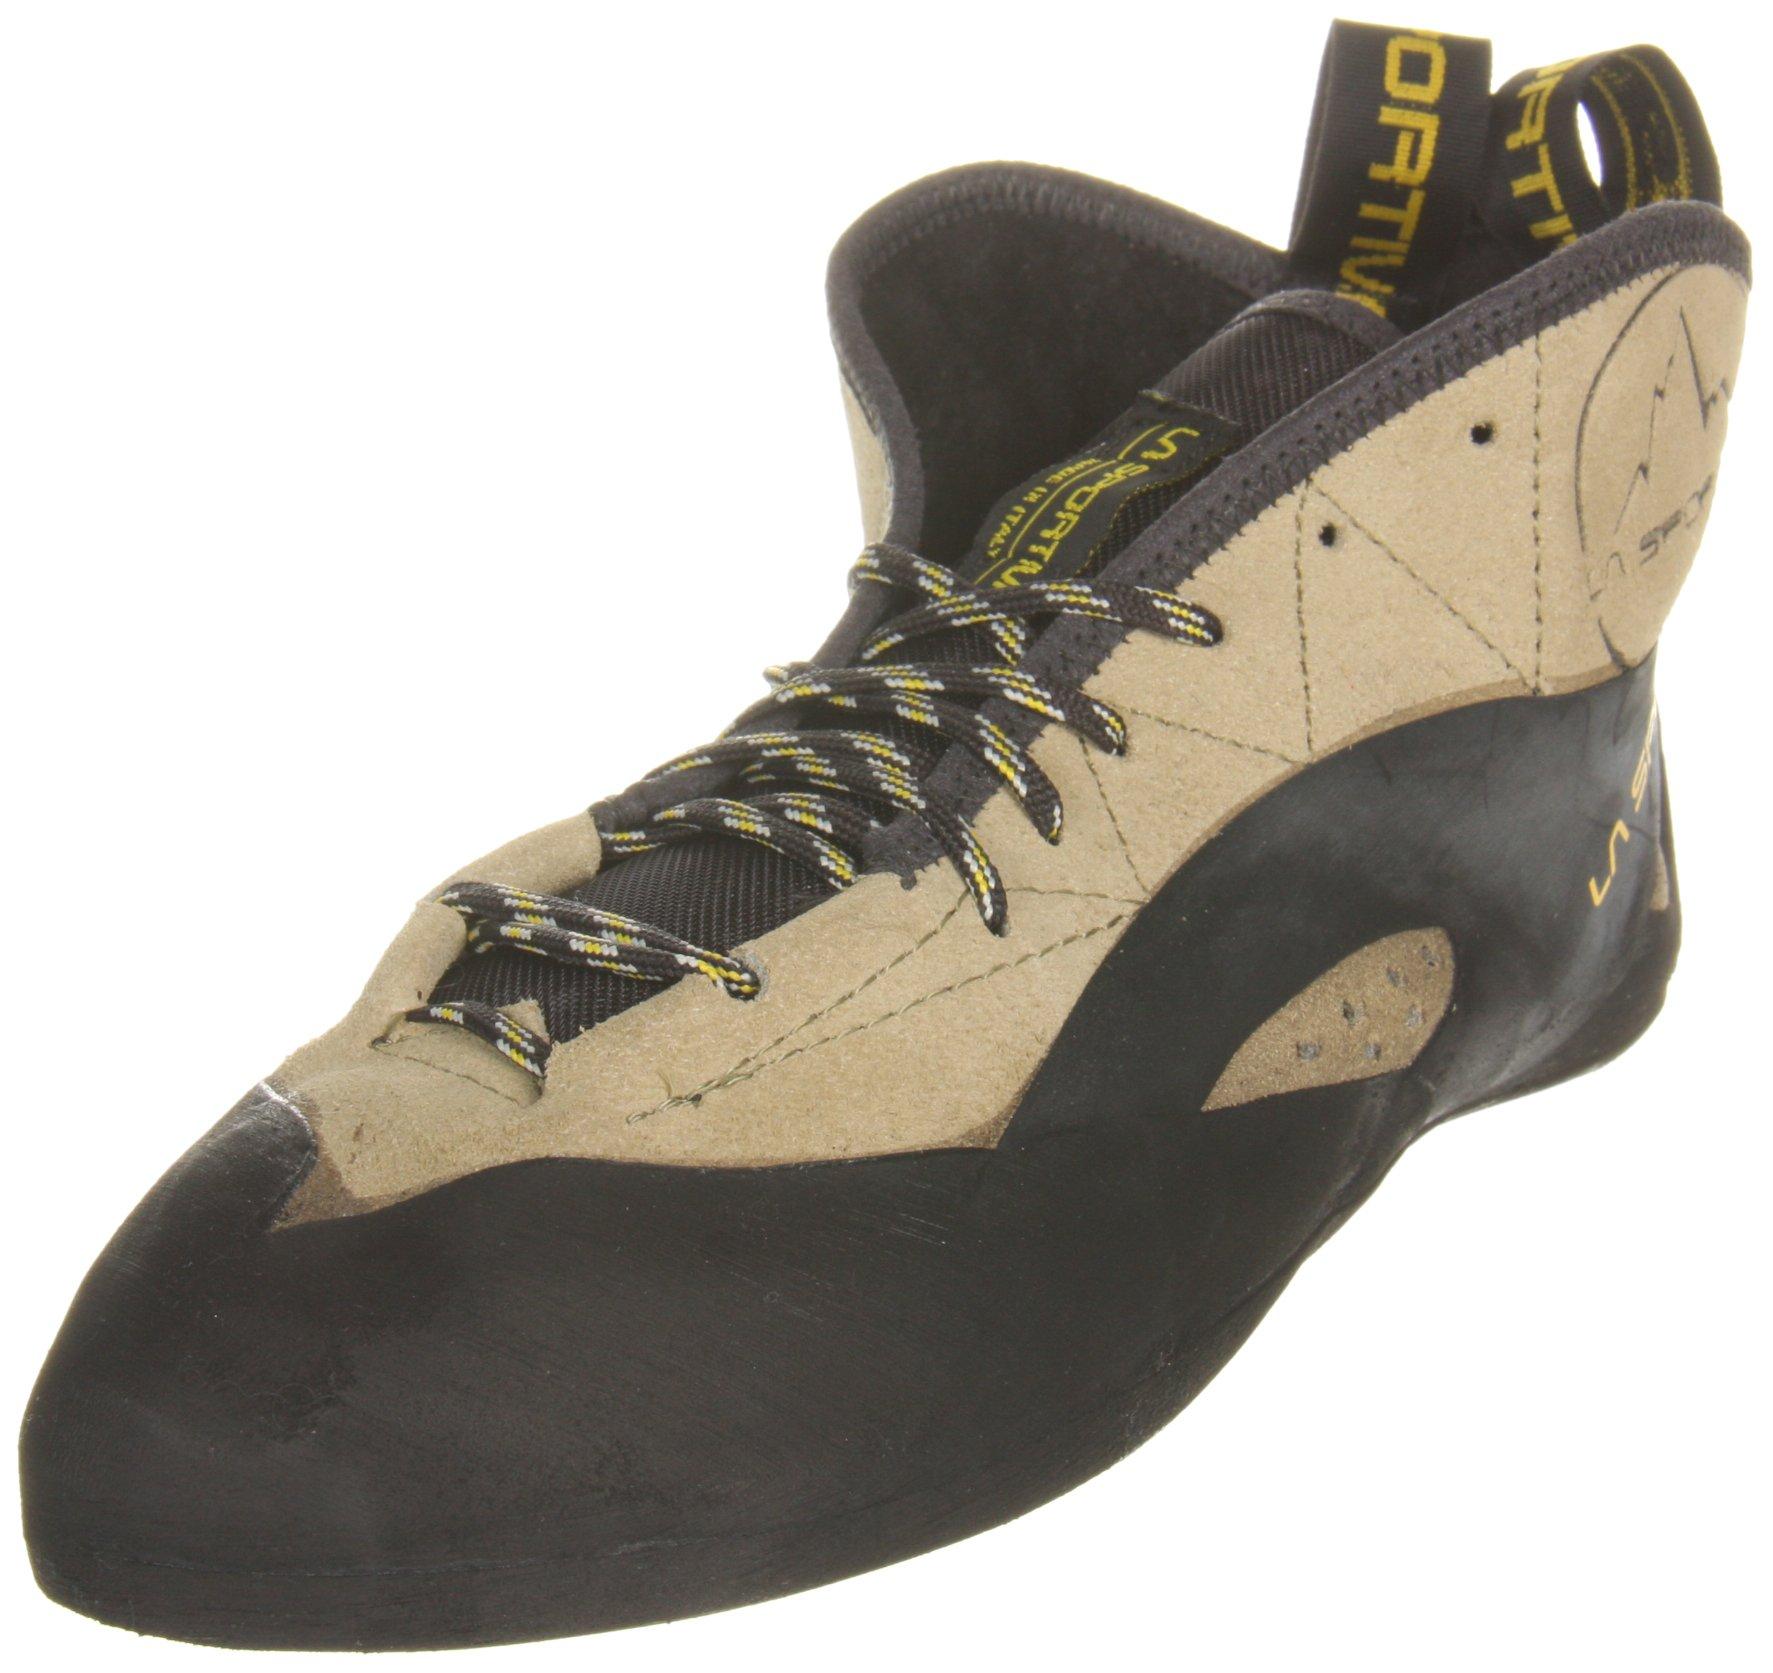 La Sportiva TC Pro Climbing Shoe - Men's, Sage, 37.5